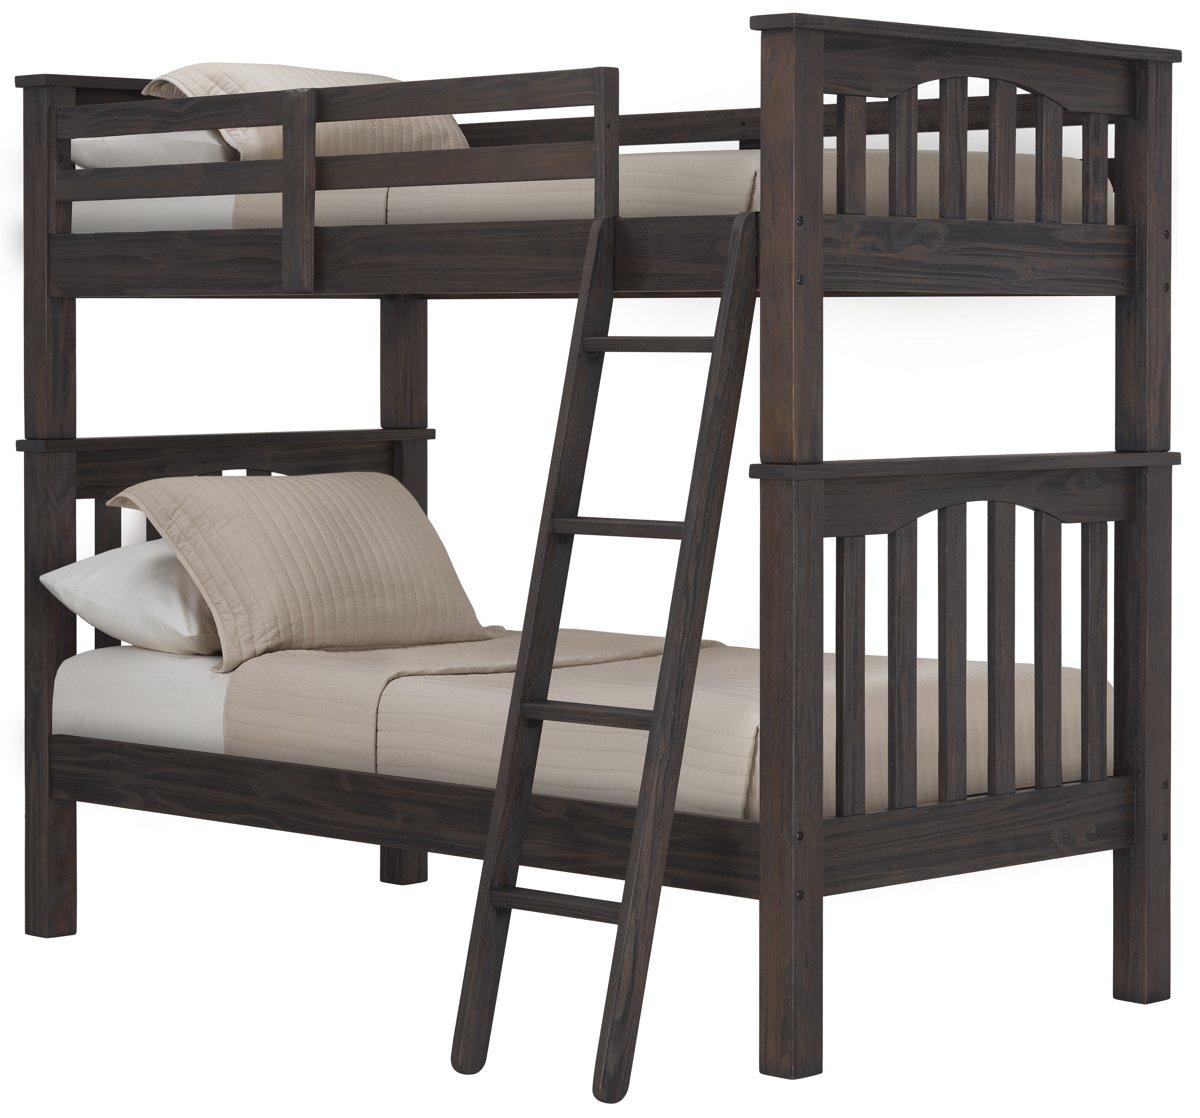 Highlands Dark Tone Wood Bunk Bed